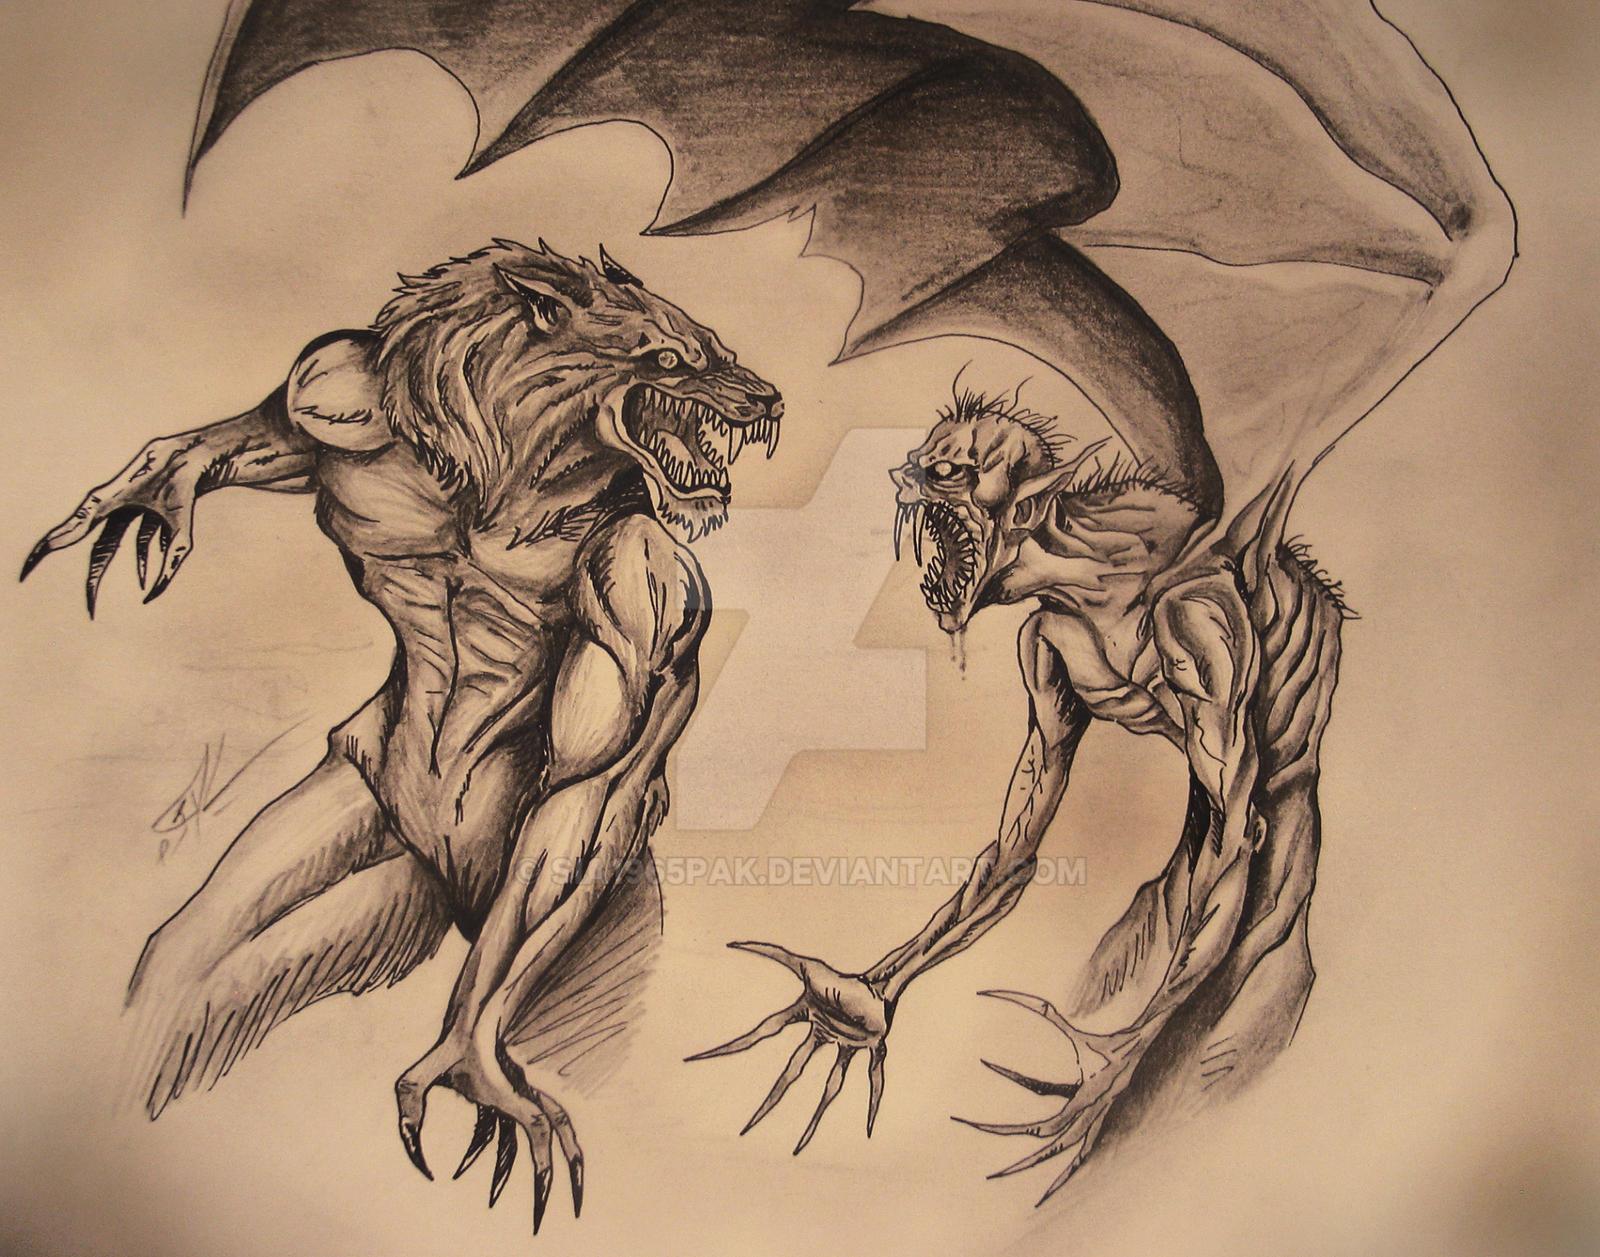 werewolf vs vampire by sia1965pak on deviantart